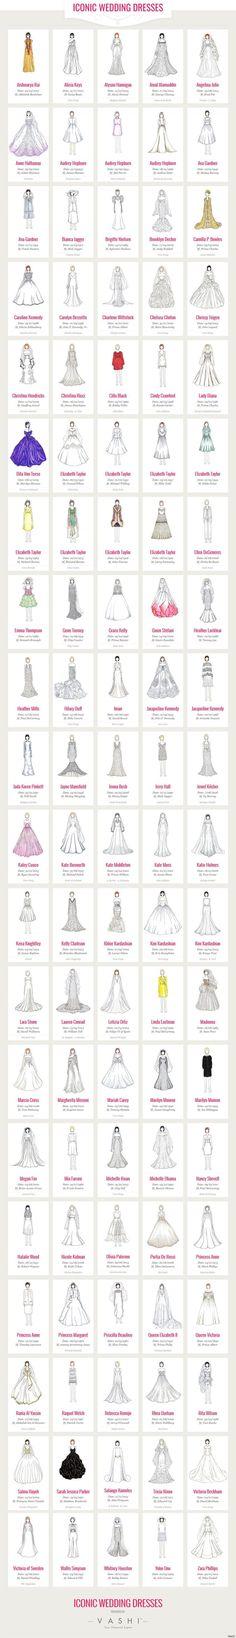 I 100 abiti da sposa più iconici di sempre